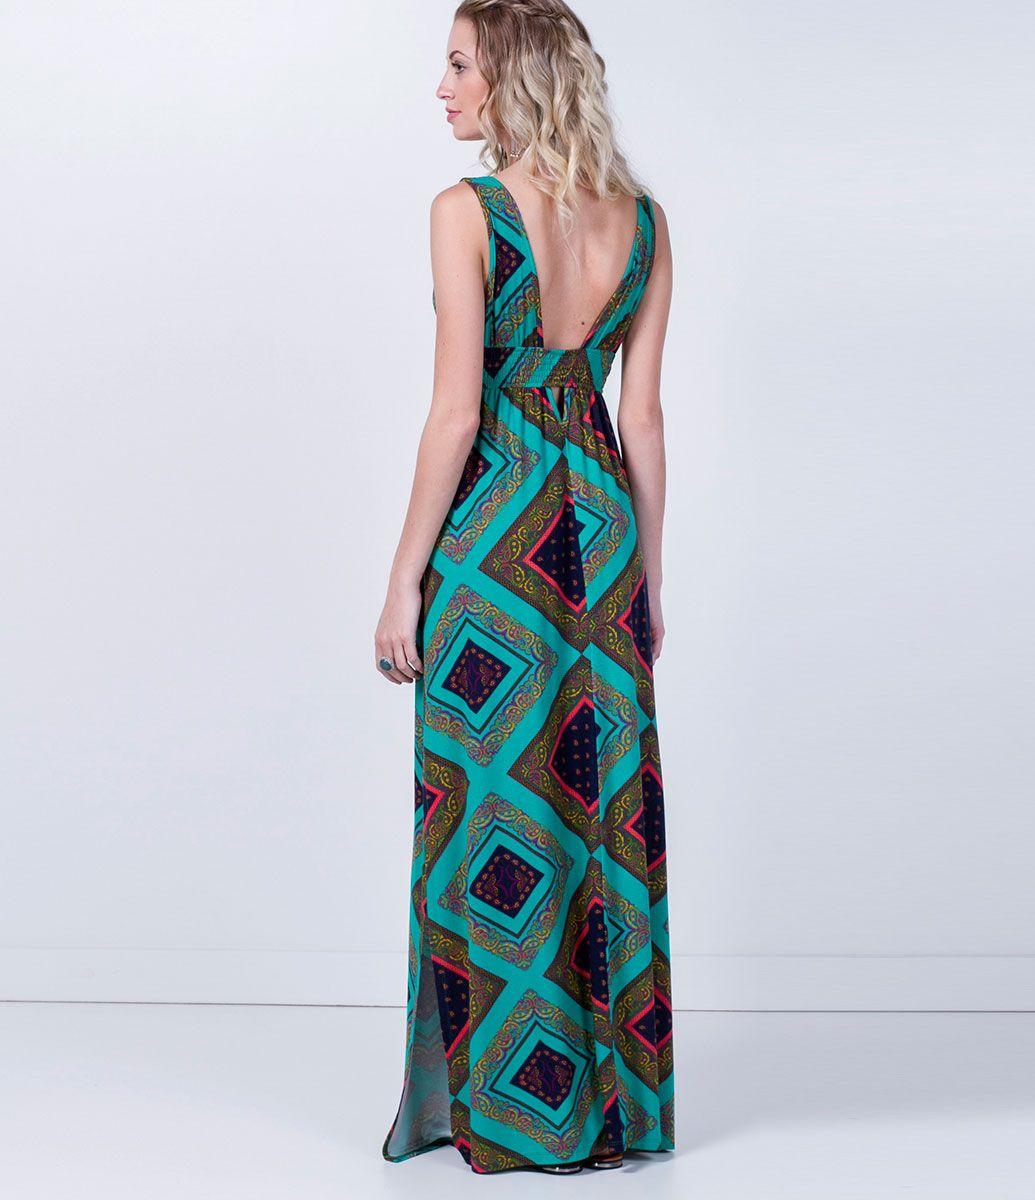 5699171df Vestido feminino Modelo longo Sem manga Fenda lateral Estampado Marca: Blue  Steel Tecido: malha